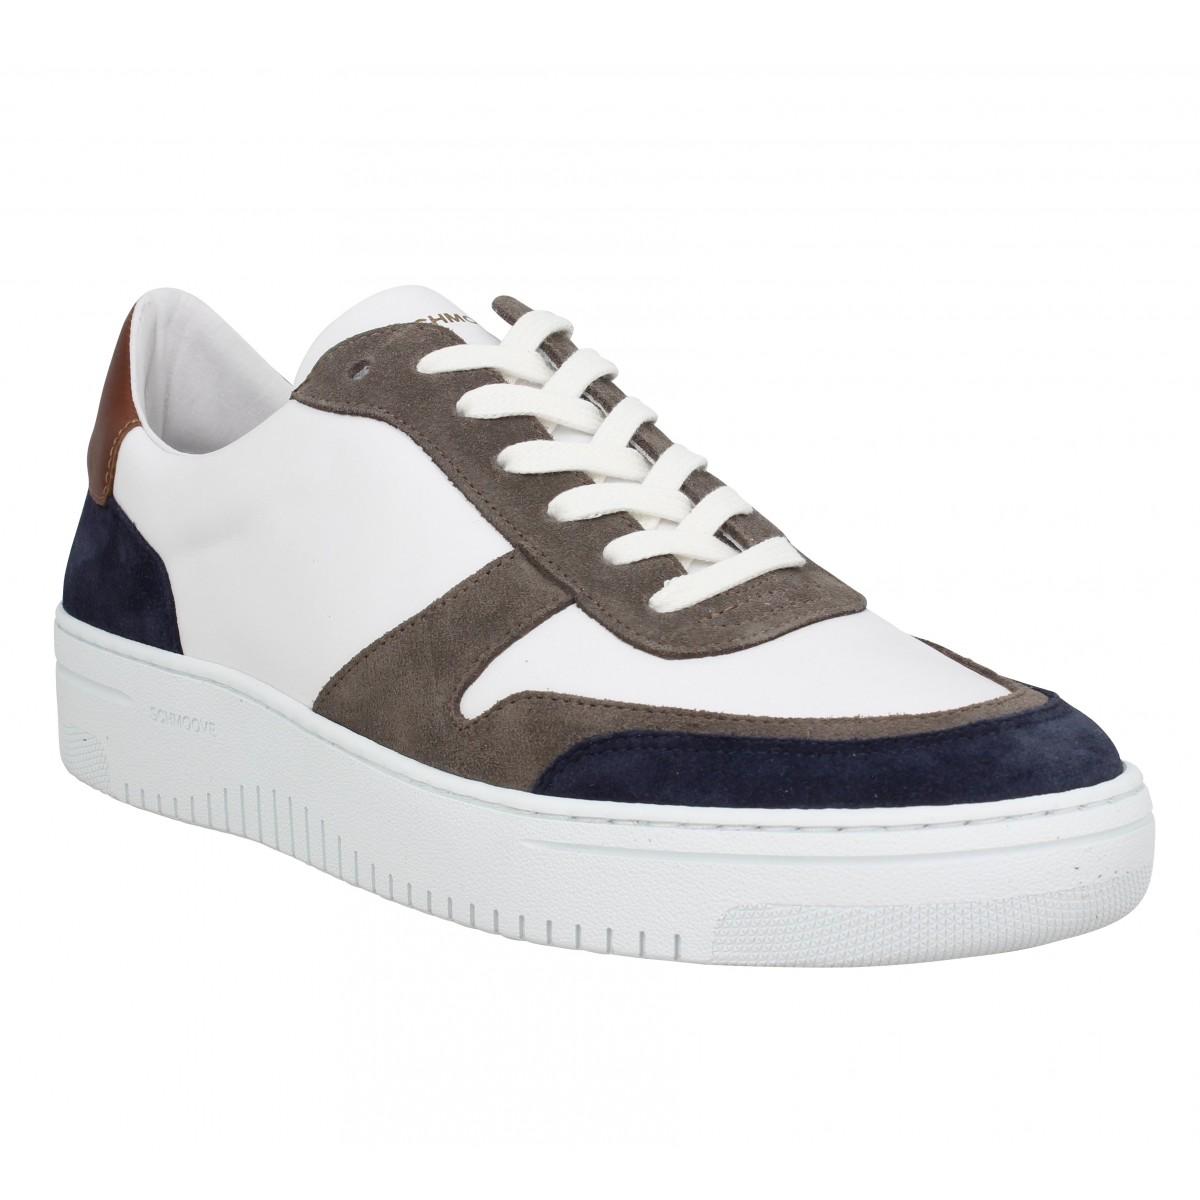 Baskets SCHMOOVE Evoc Sneaker cuir velours Homme Marine Cognac